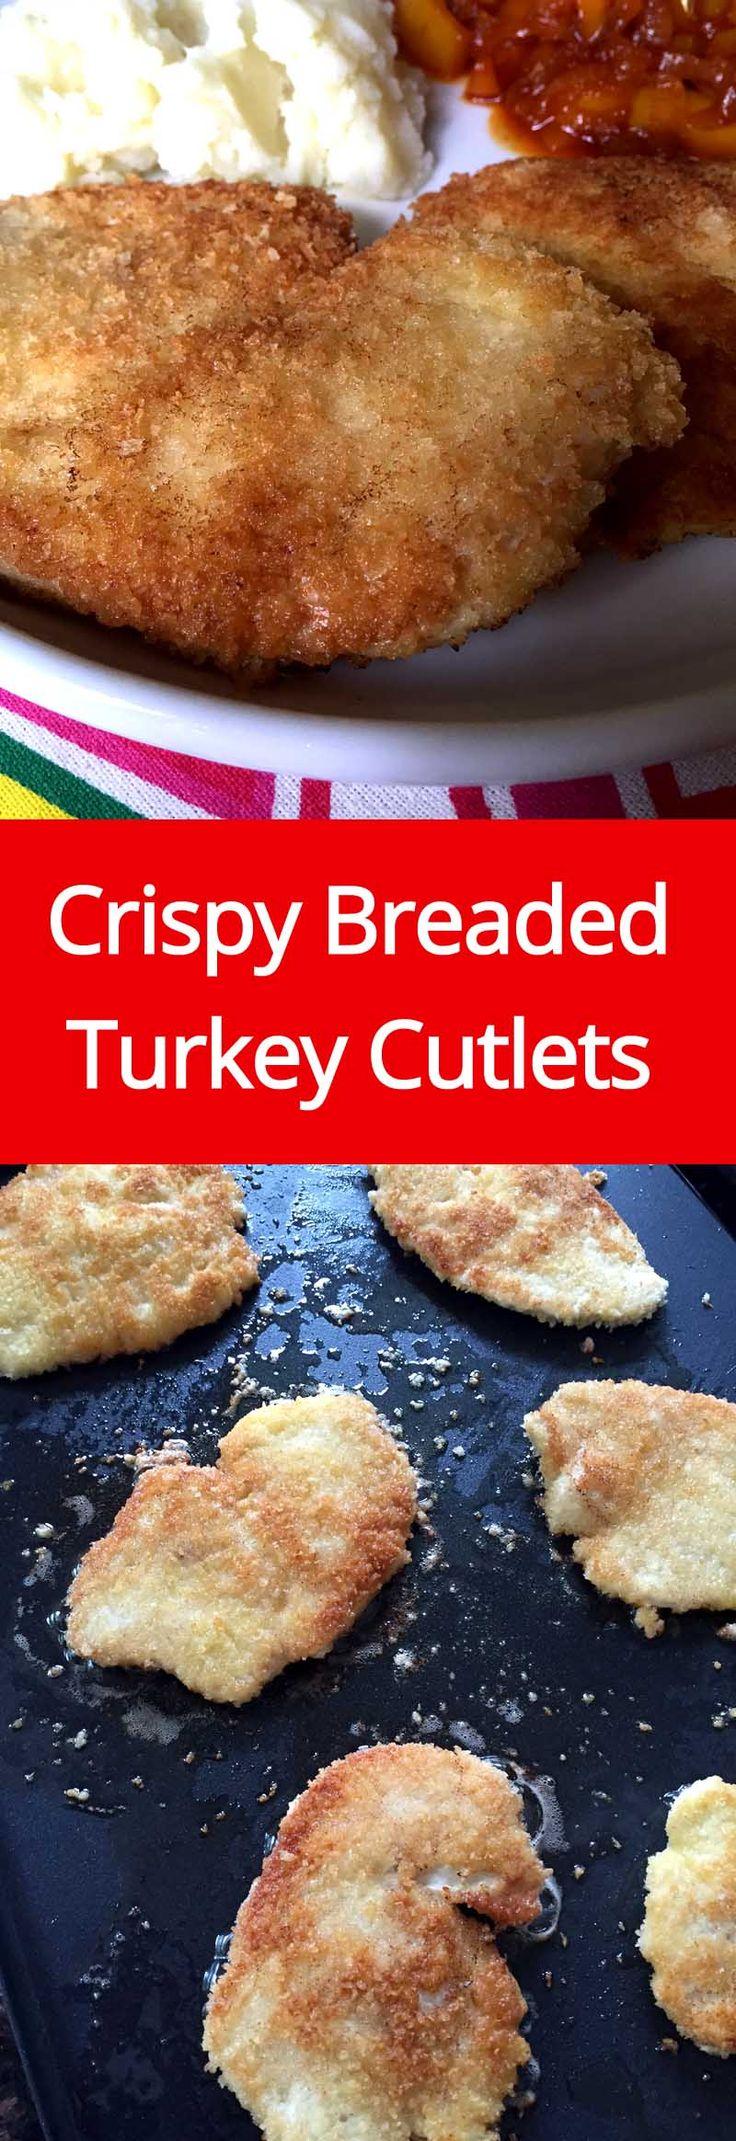 Crispy Panko Breaded Pan-Fried Turkey Cutlets Recipe   MelanieCooks.com